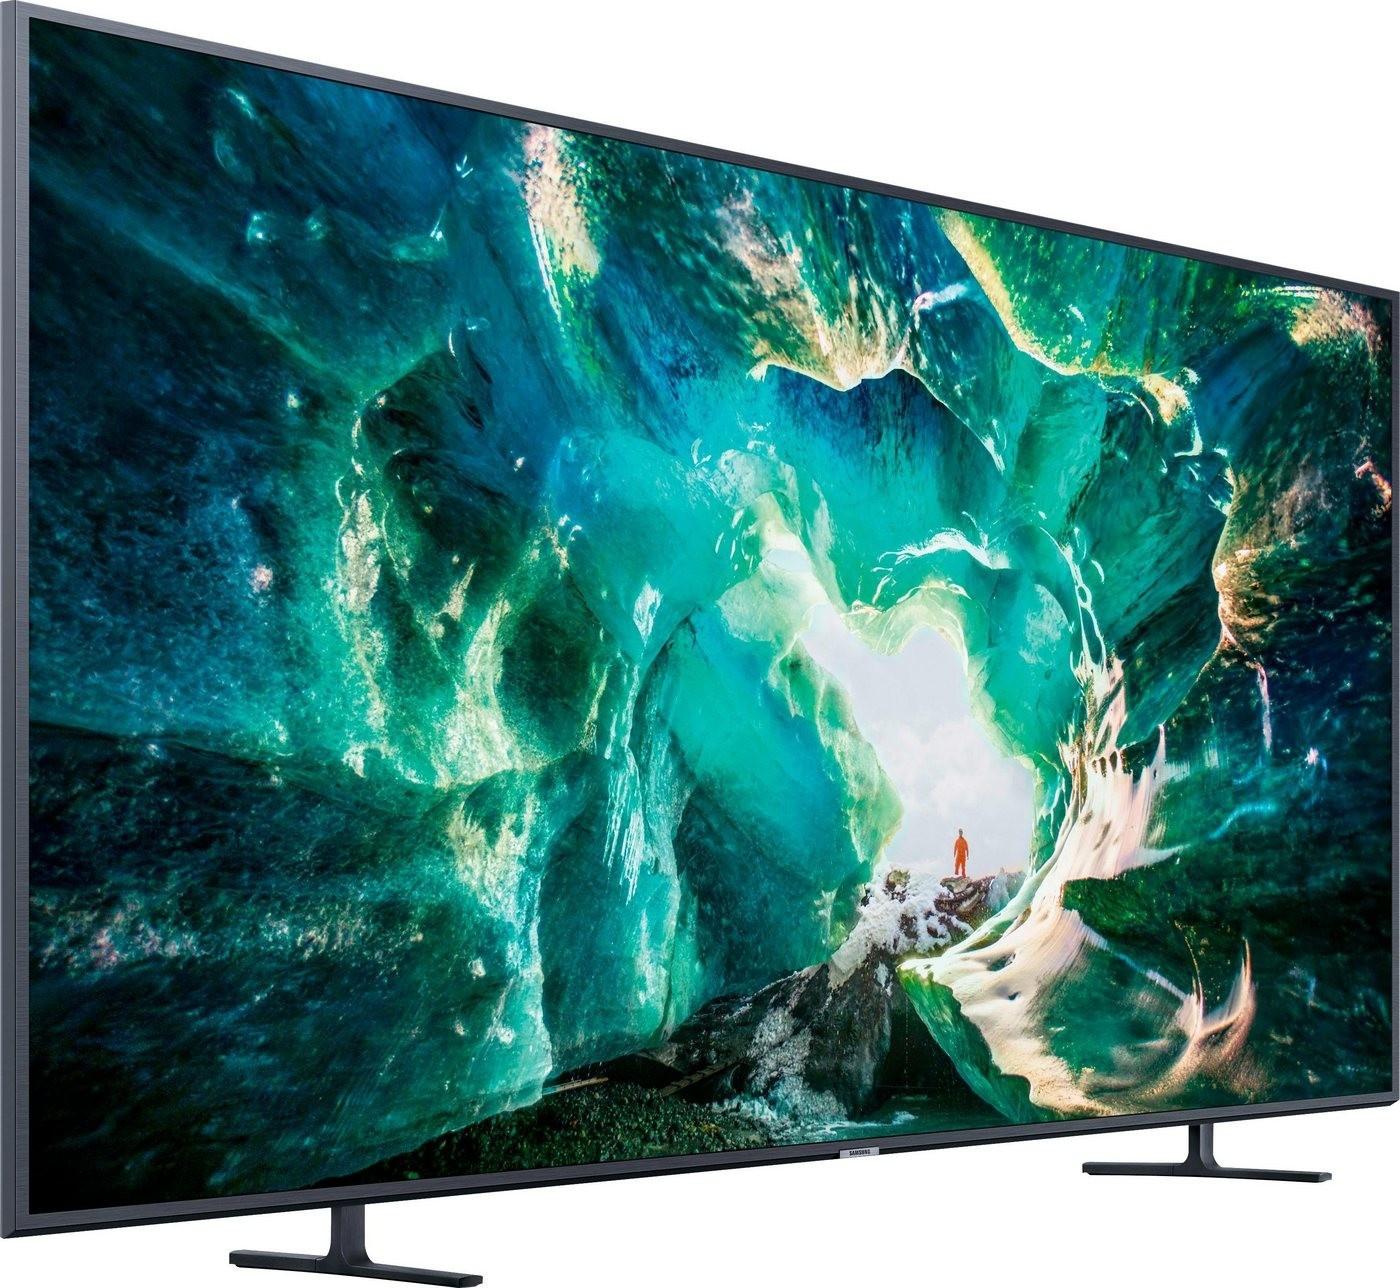 TV-Angebote zum Singles' Day: z.B. Samsung UE65RU8009 - 849€ | Philips 55PUS8804 - 699€ | Sony KD-55XF9005 - 749€